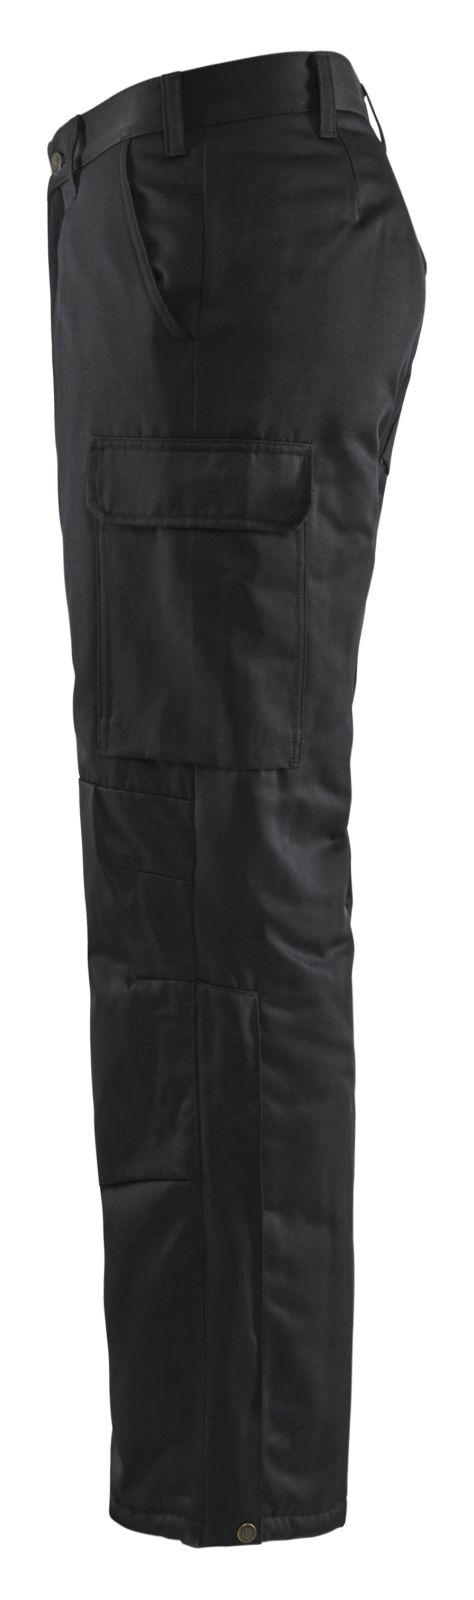 Blaklader Winterbroeken 18001900 zwart(9900)